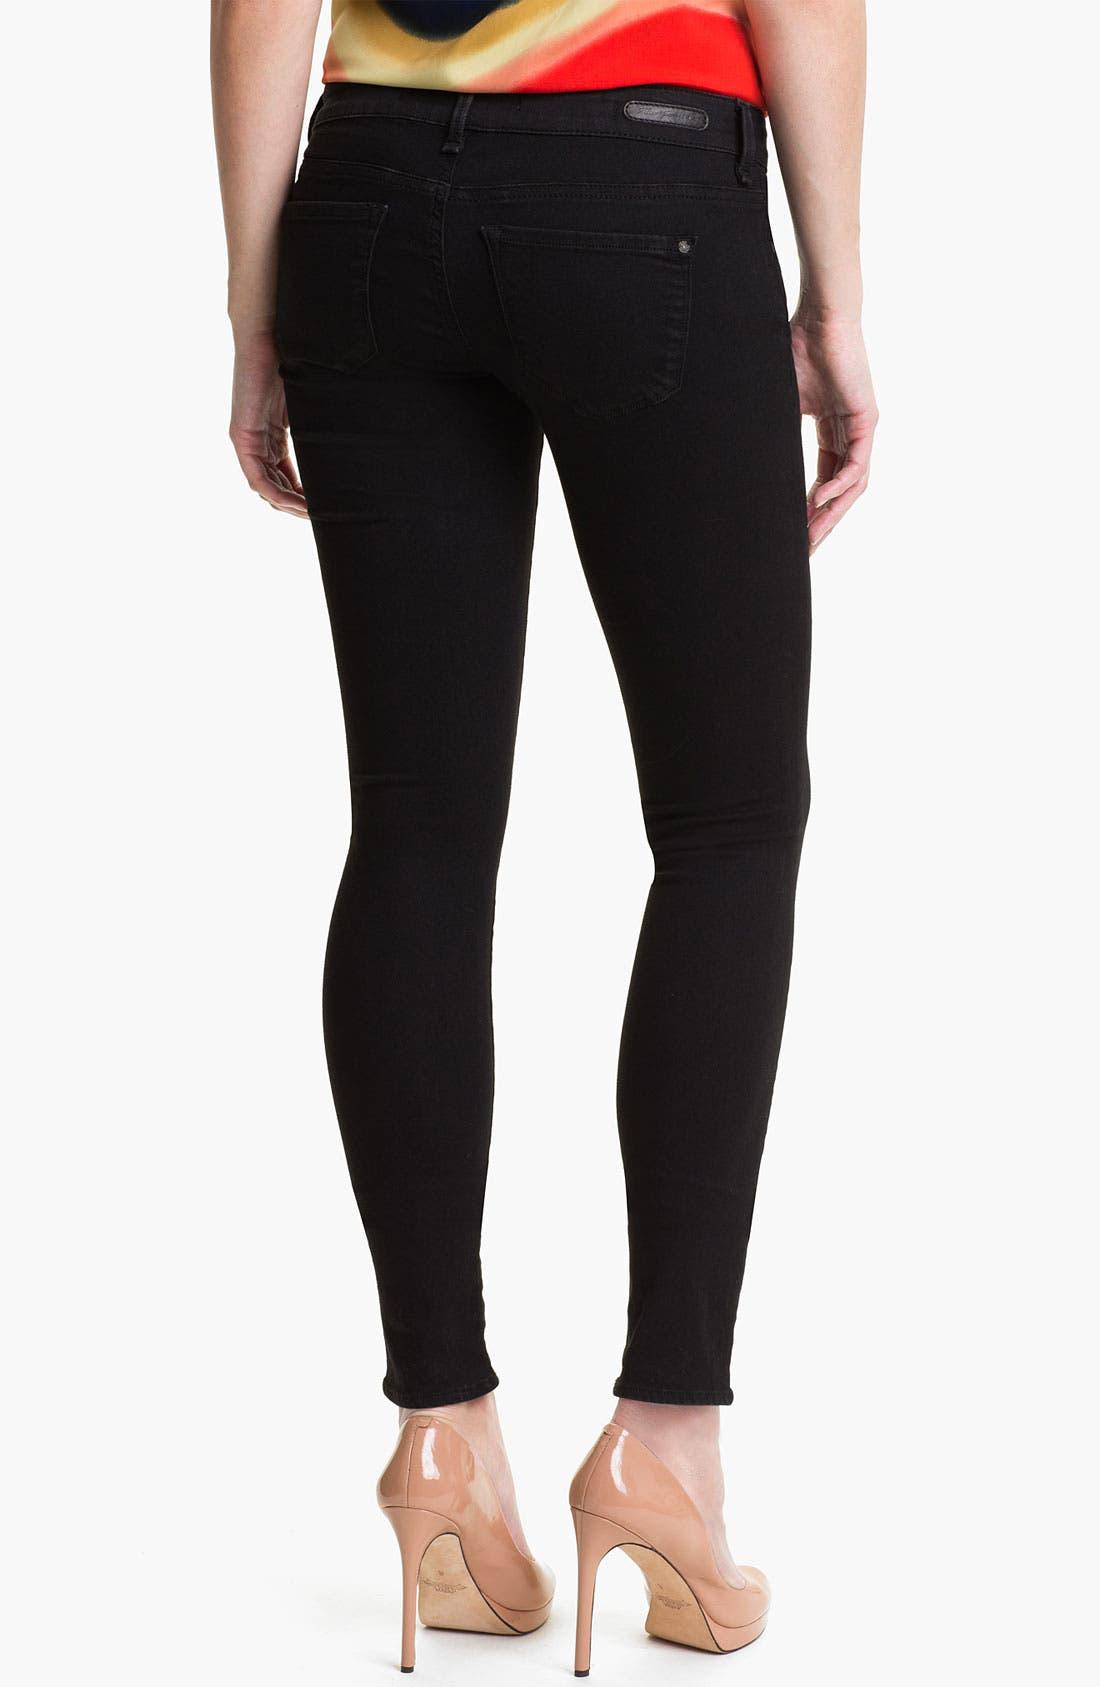 Alternate Image 2  - Mavi Jeans 'Serena' Low Rise Super Skinny Jeans (Black Shanti) (Online Exclusive)